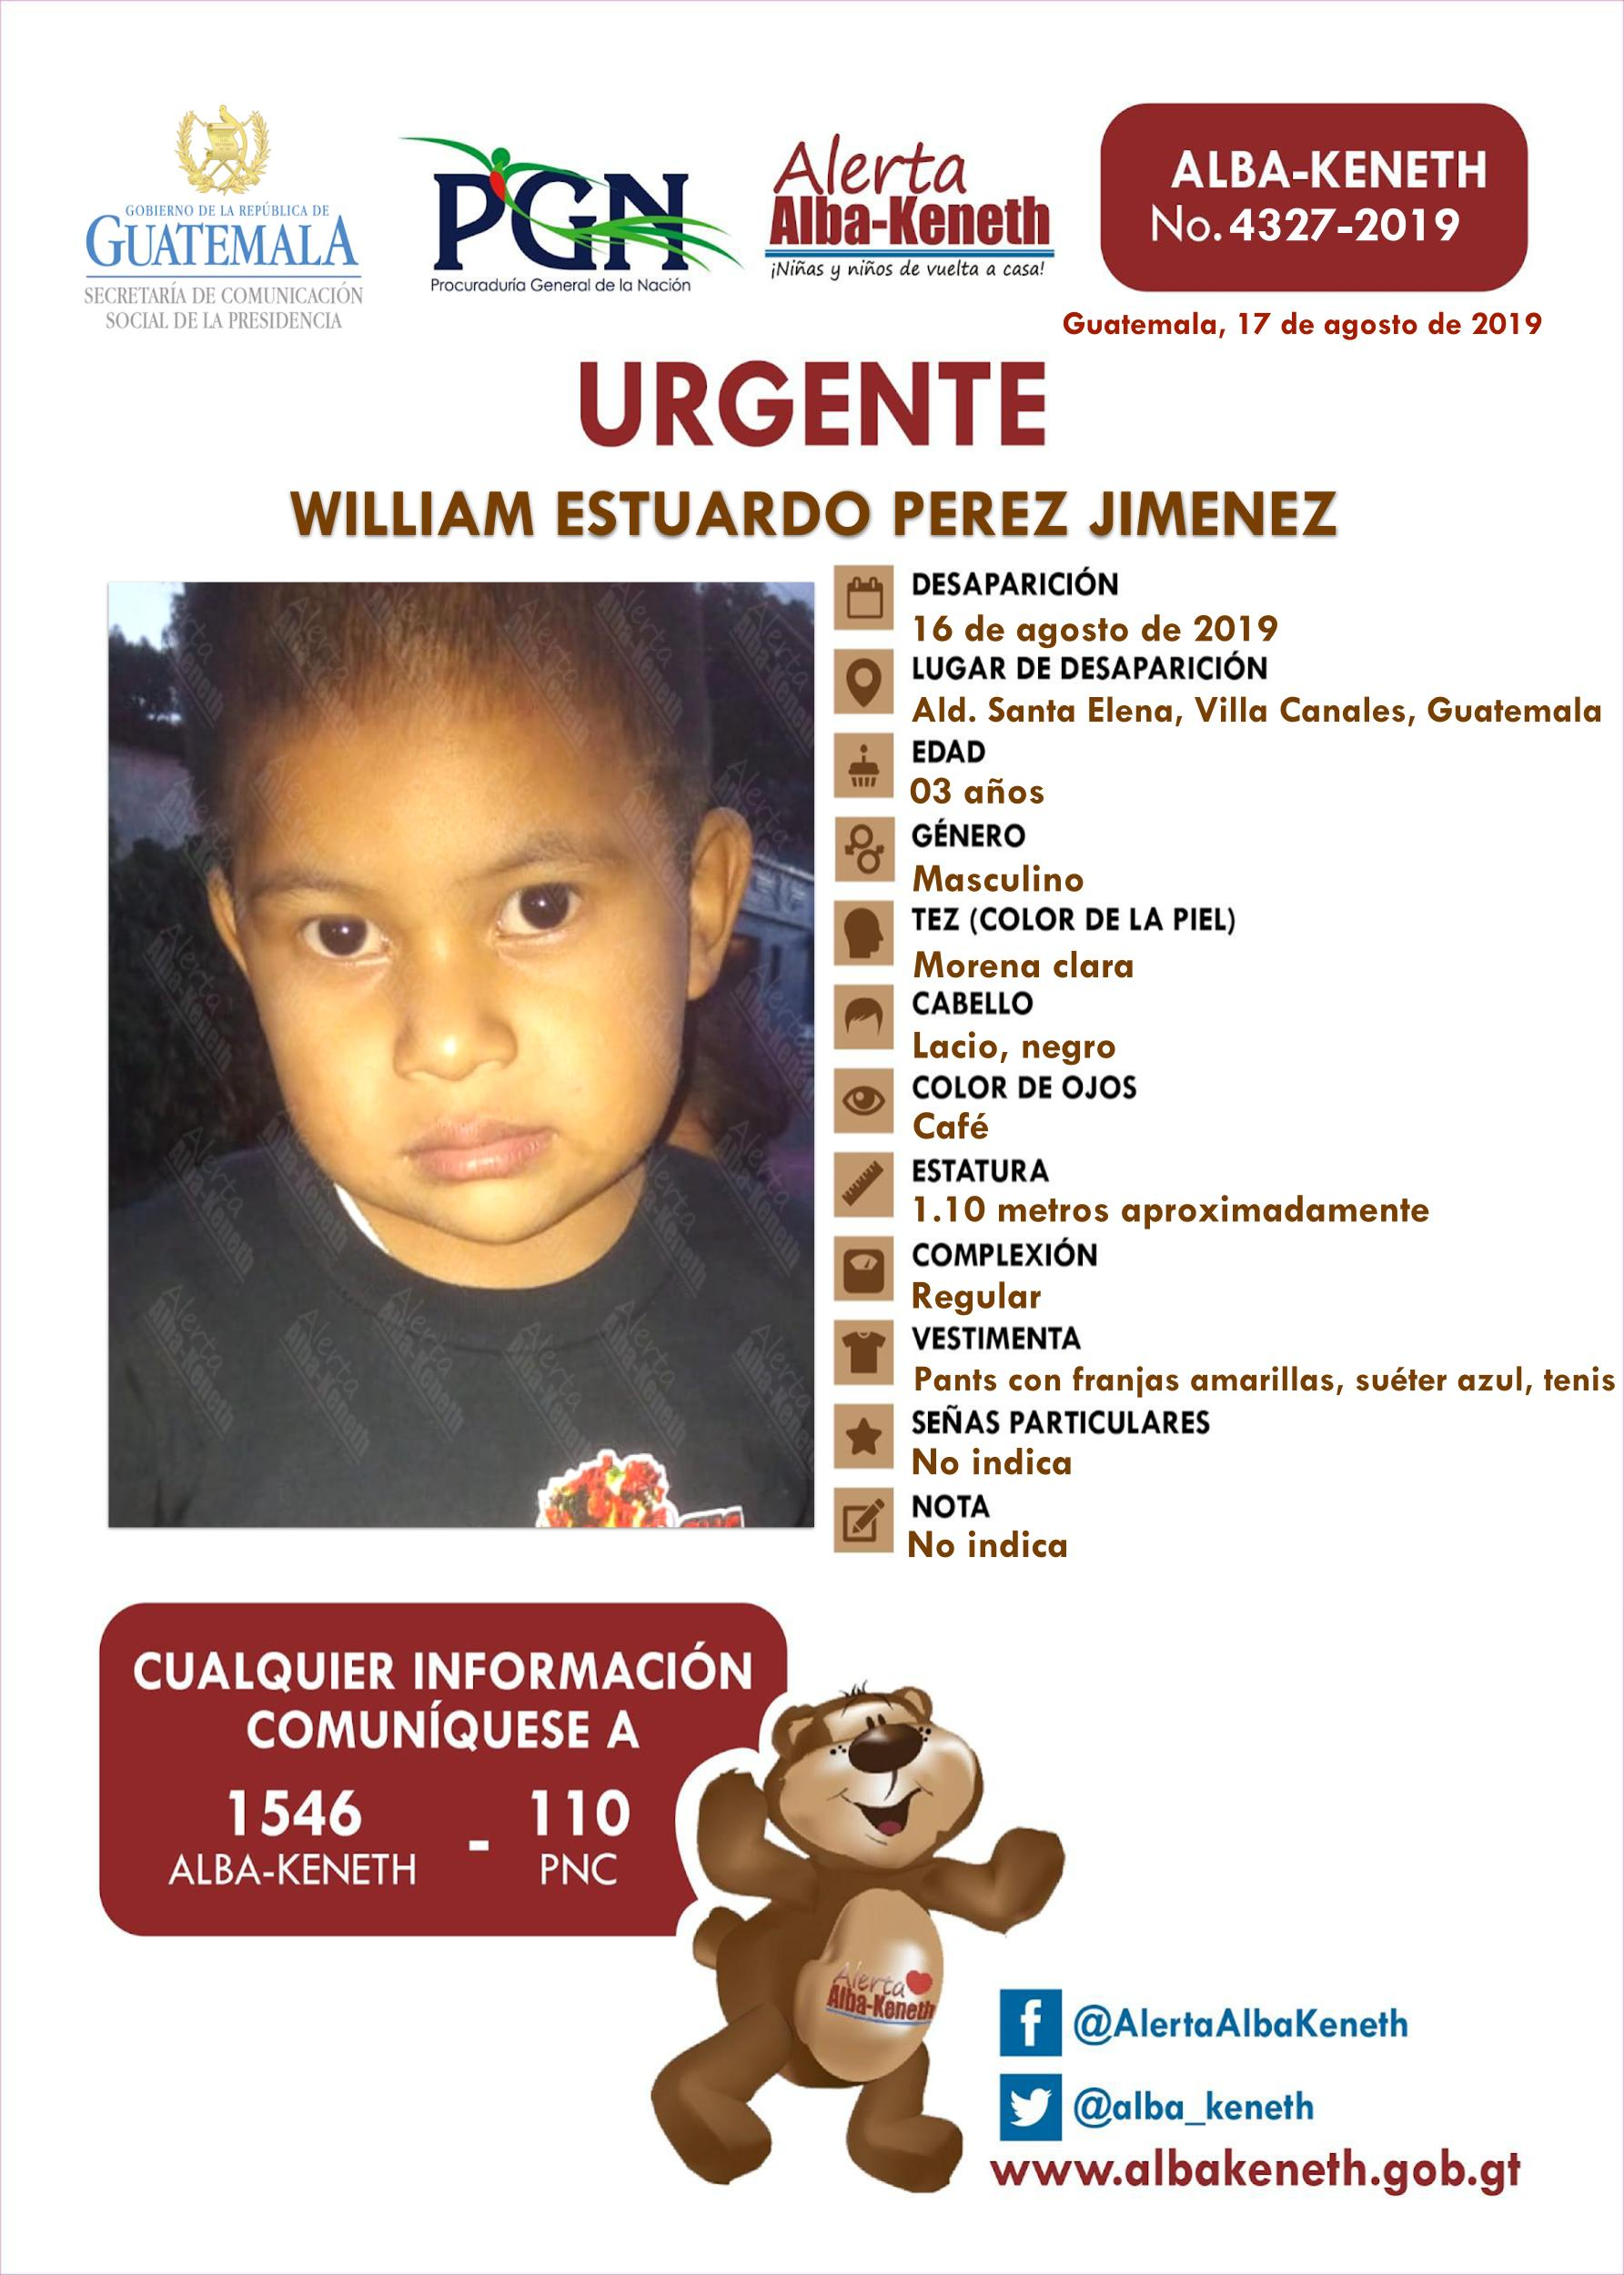 William Estuardo Perez Jimenez